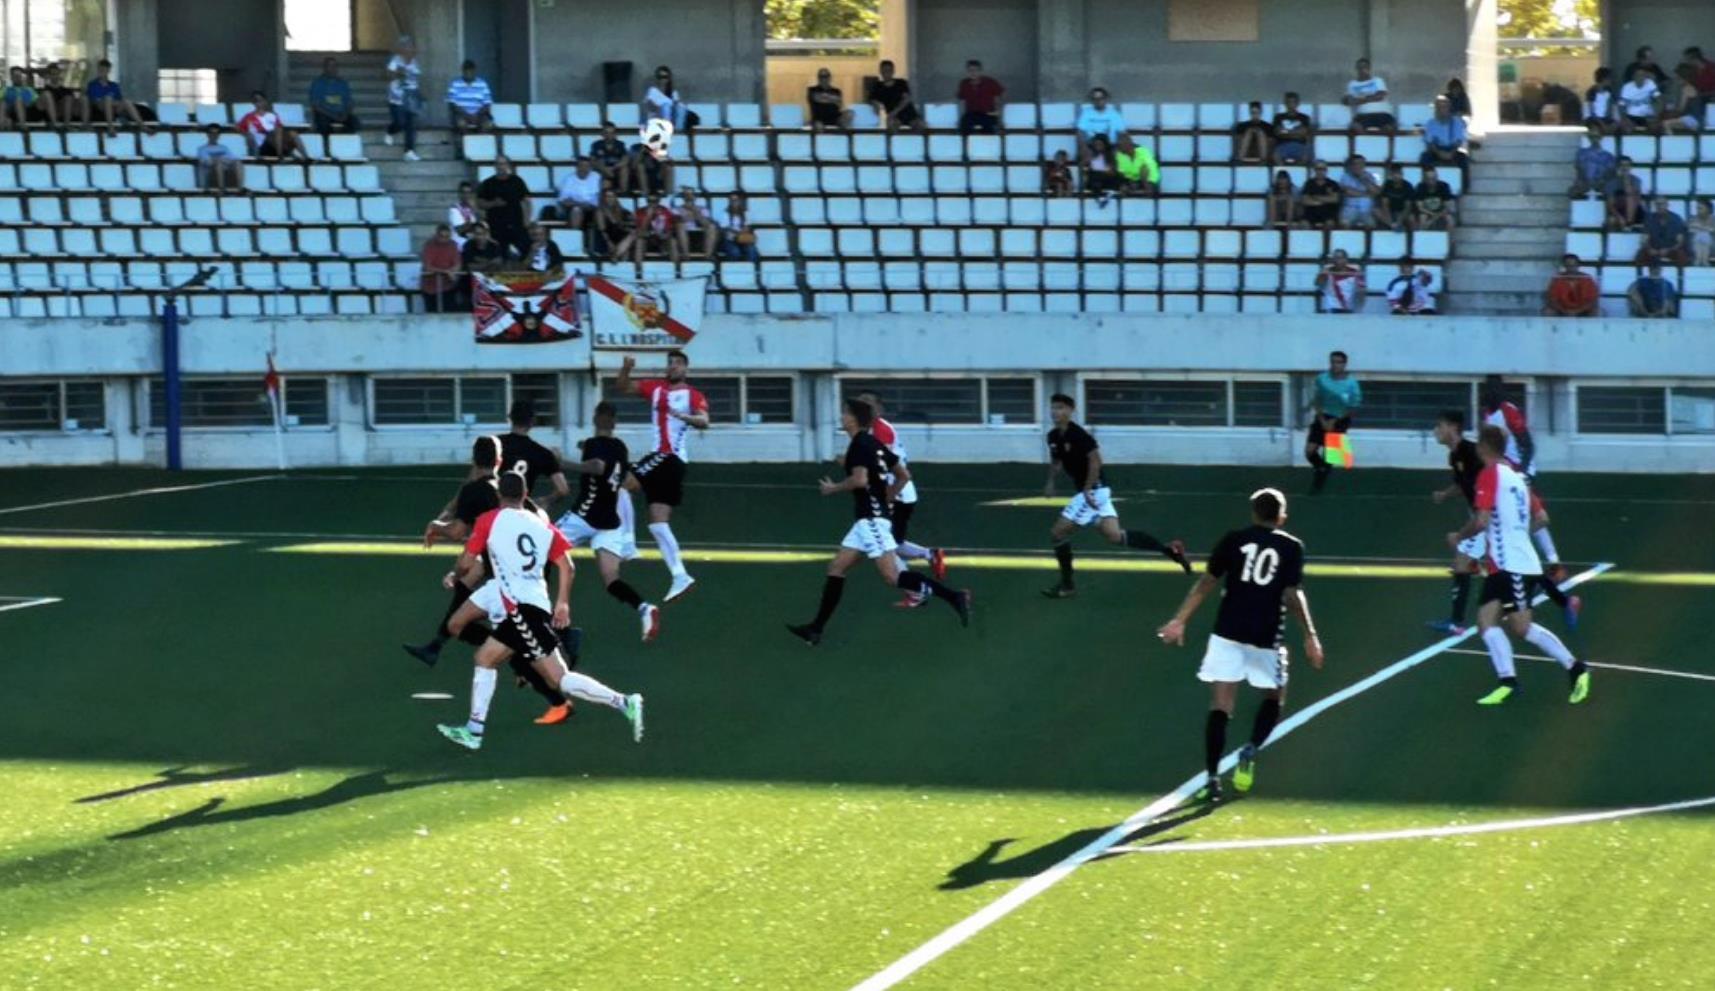 Derrota del CF Pobla de Mafumet contra el CE Hospitalet per 2-0